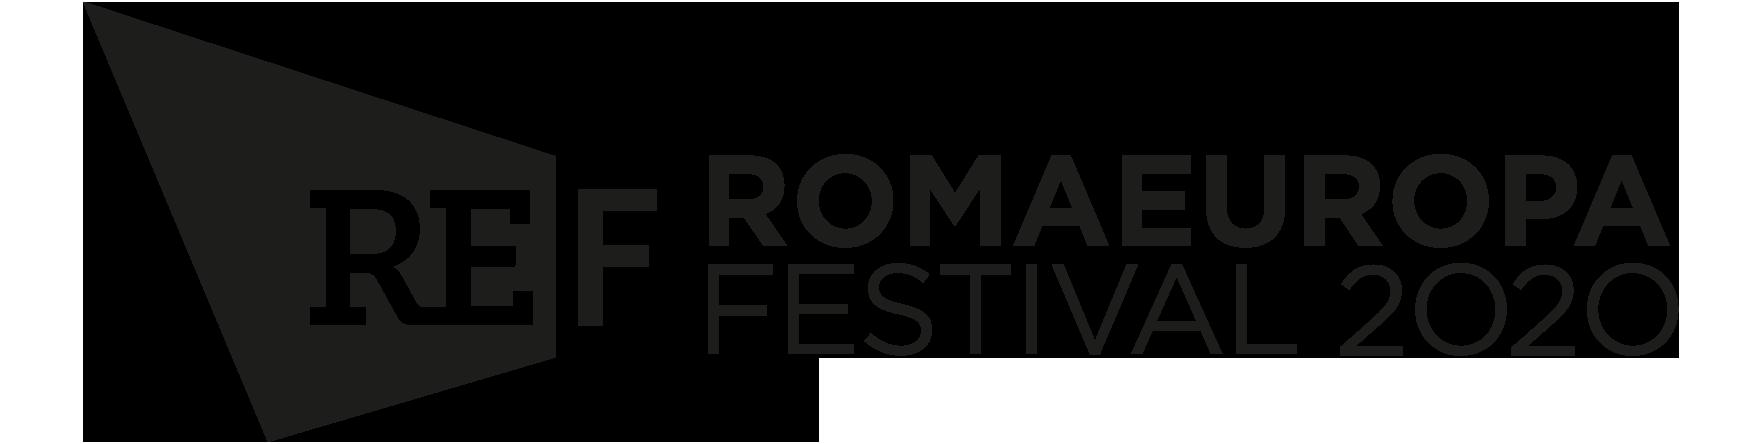 Romaeuropa Festival